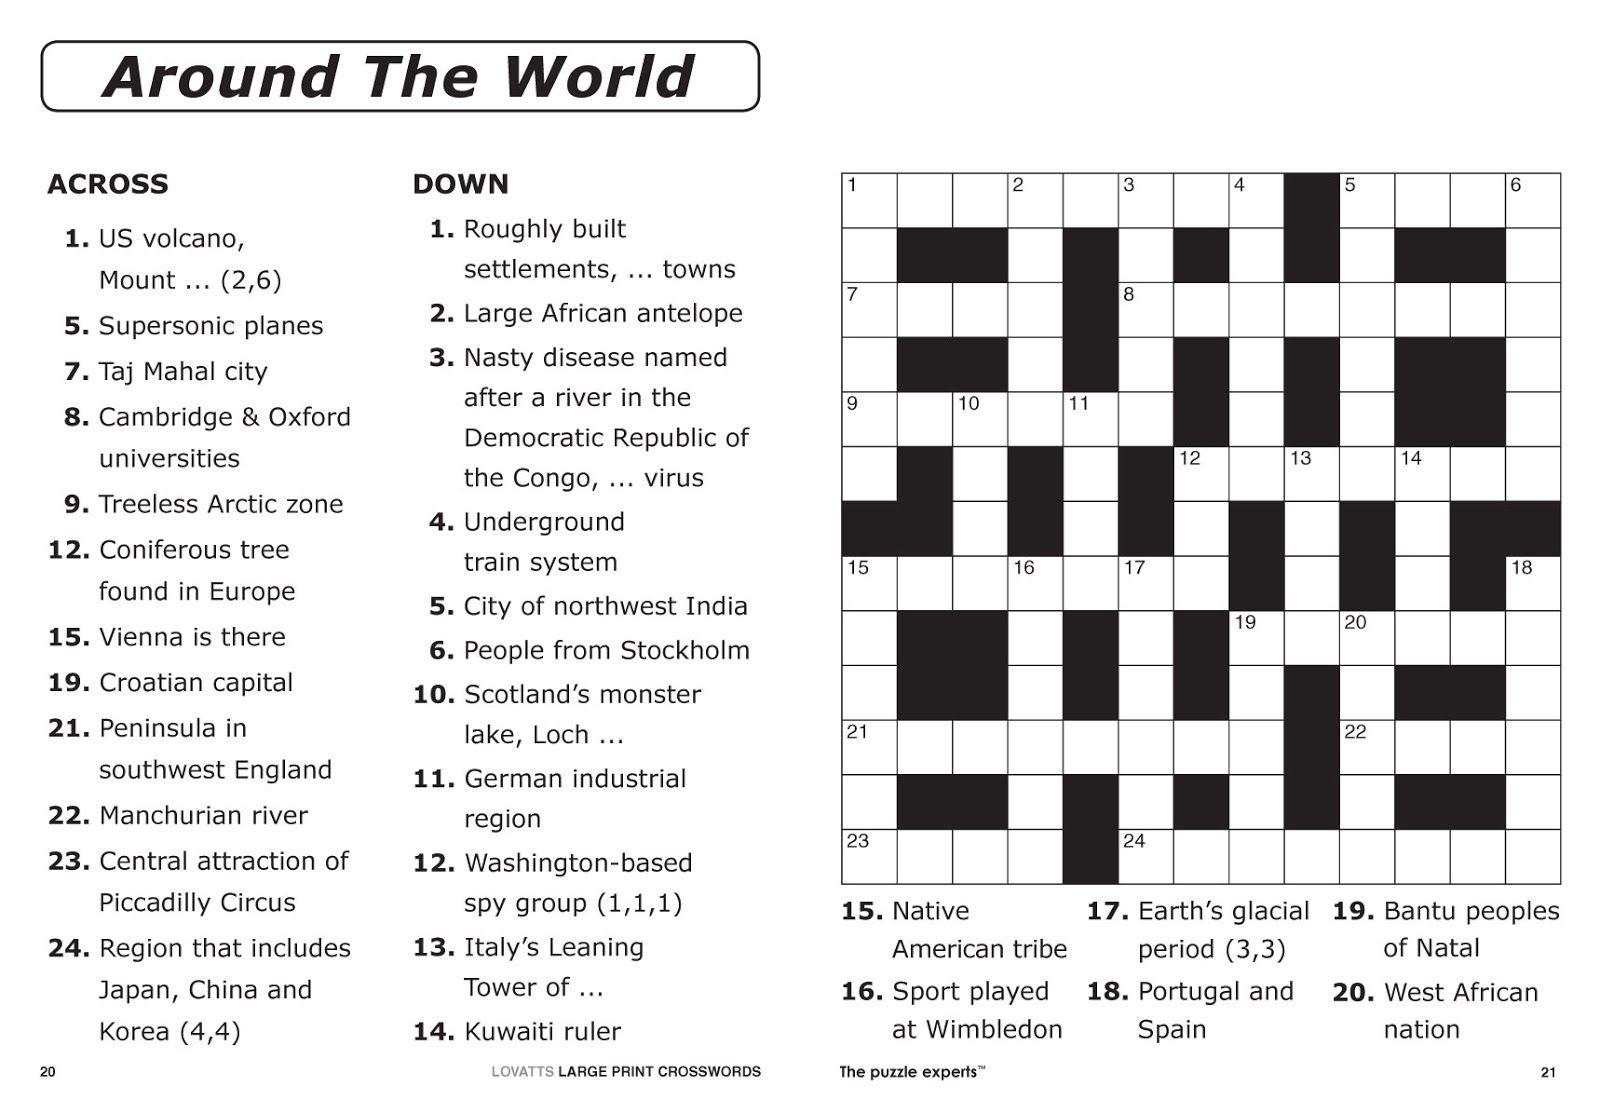 Easy Printable Crossword Puzzles | Elder Care & Dementia Care - Free Printable Crossword Puzzles For Dementia Patients